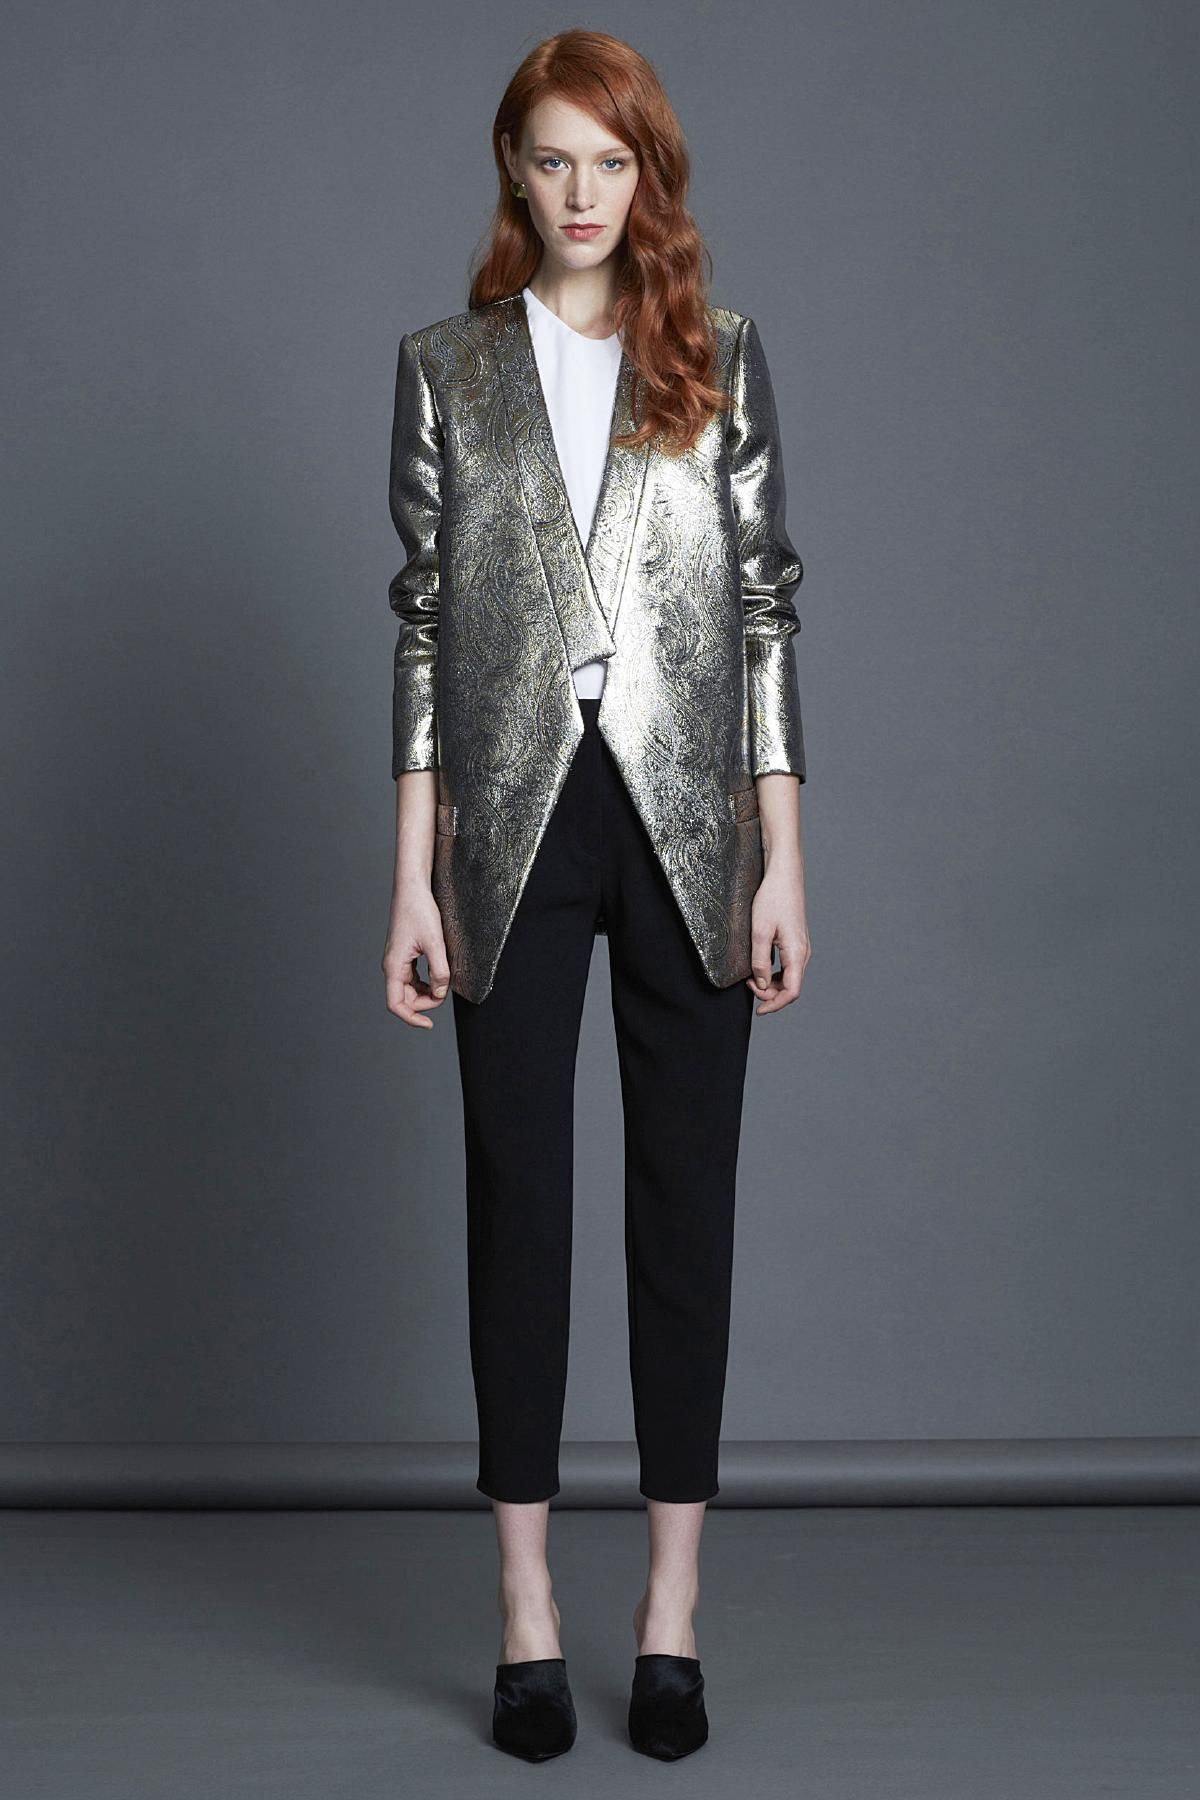 Jenni Kayne Fall 2013 RTW Collection - Fashion on TheCut